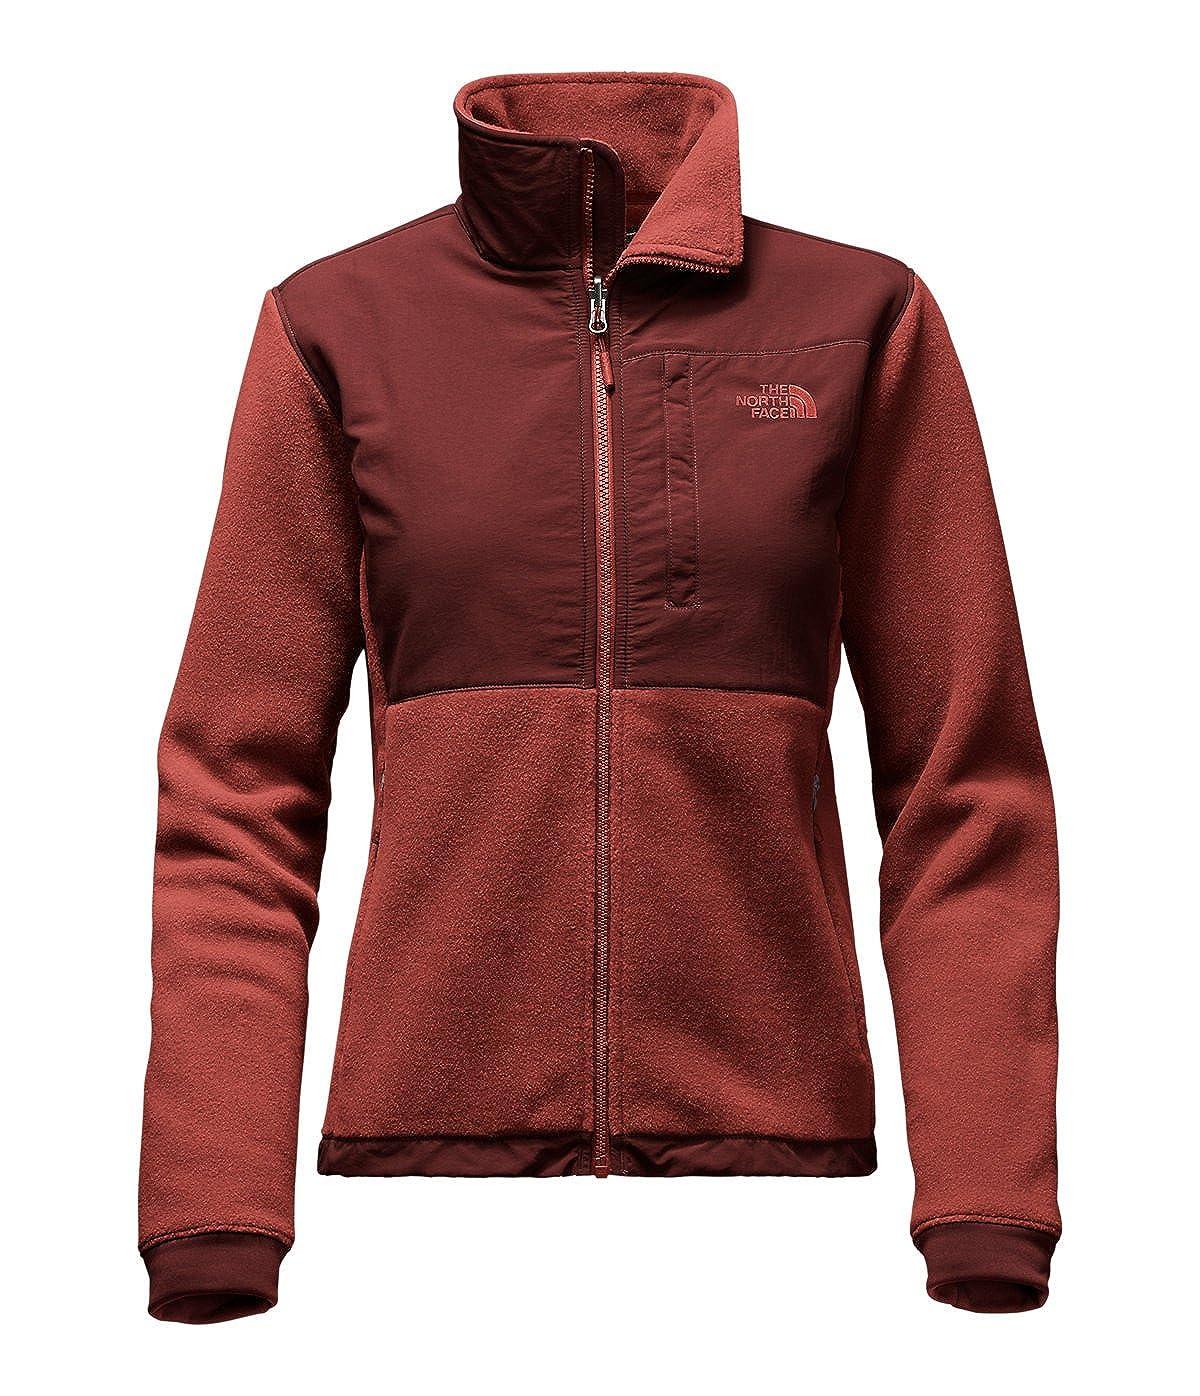 03687d777 The North Face Women Denali Jacket